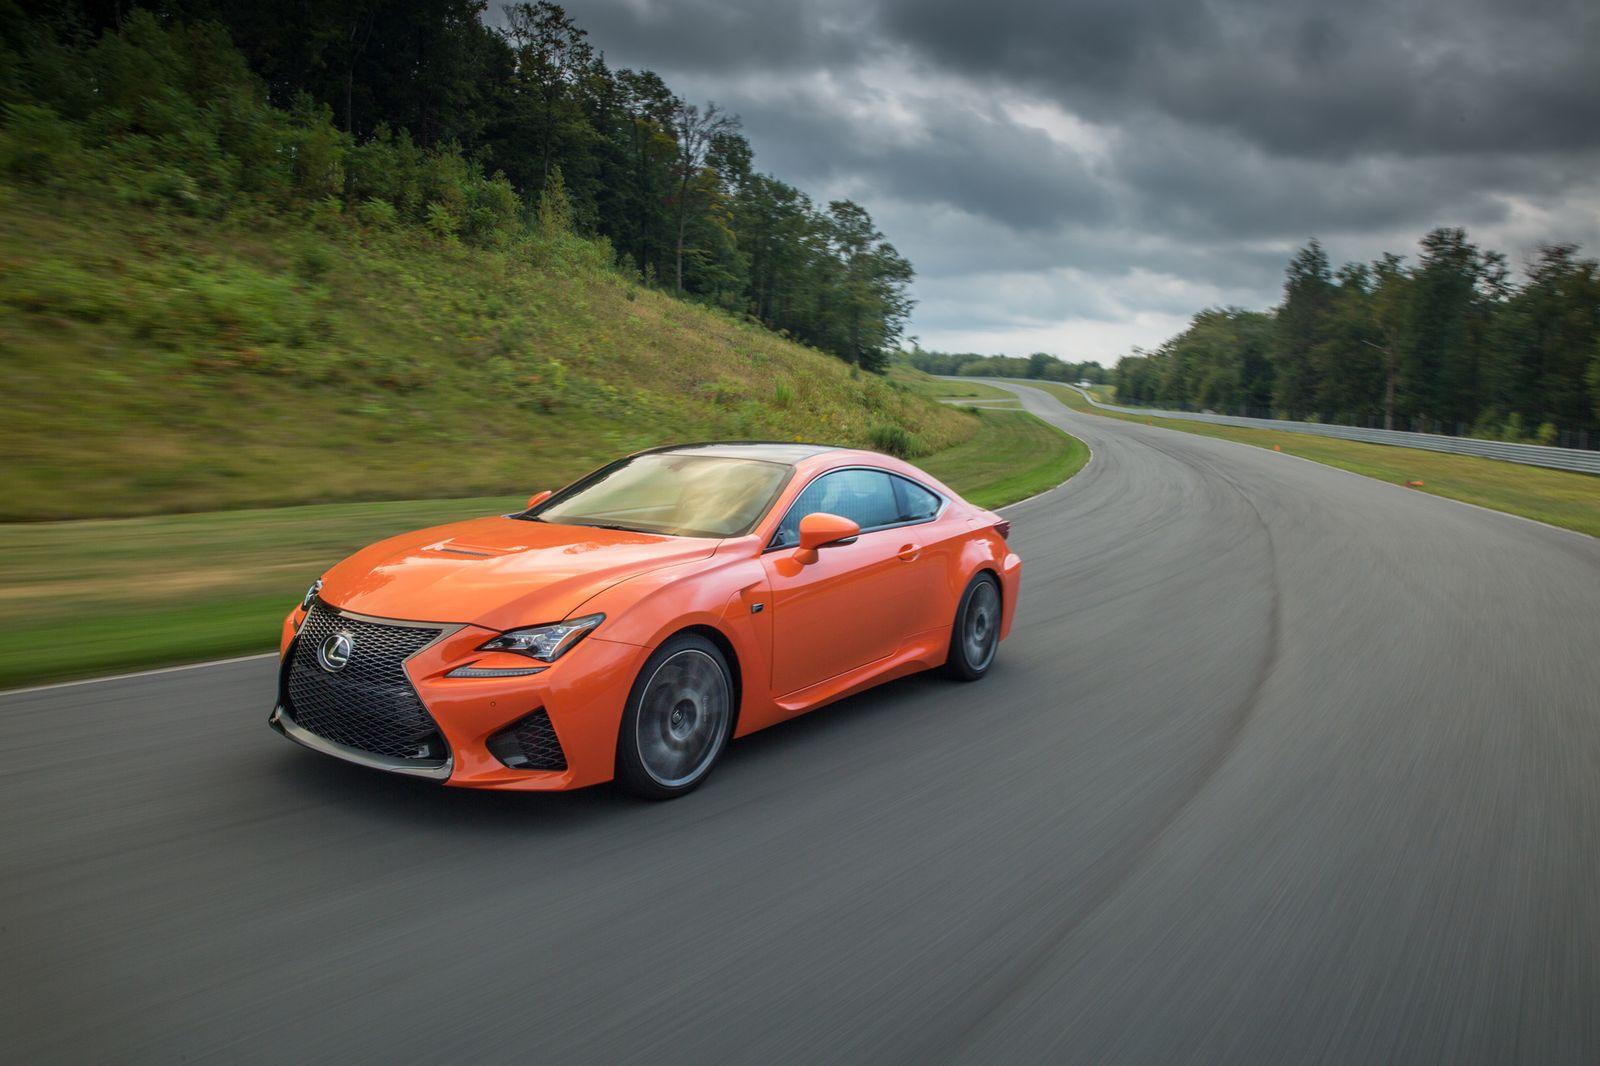 SPERRFRIST FR 05.09.14 5 Uhr / 2014 / Lexus RC-F